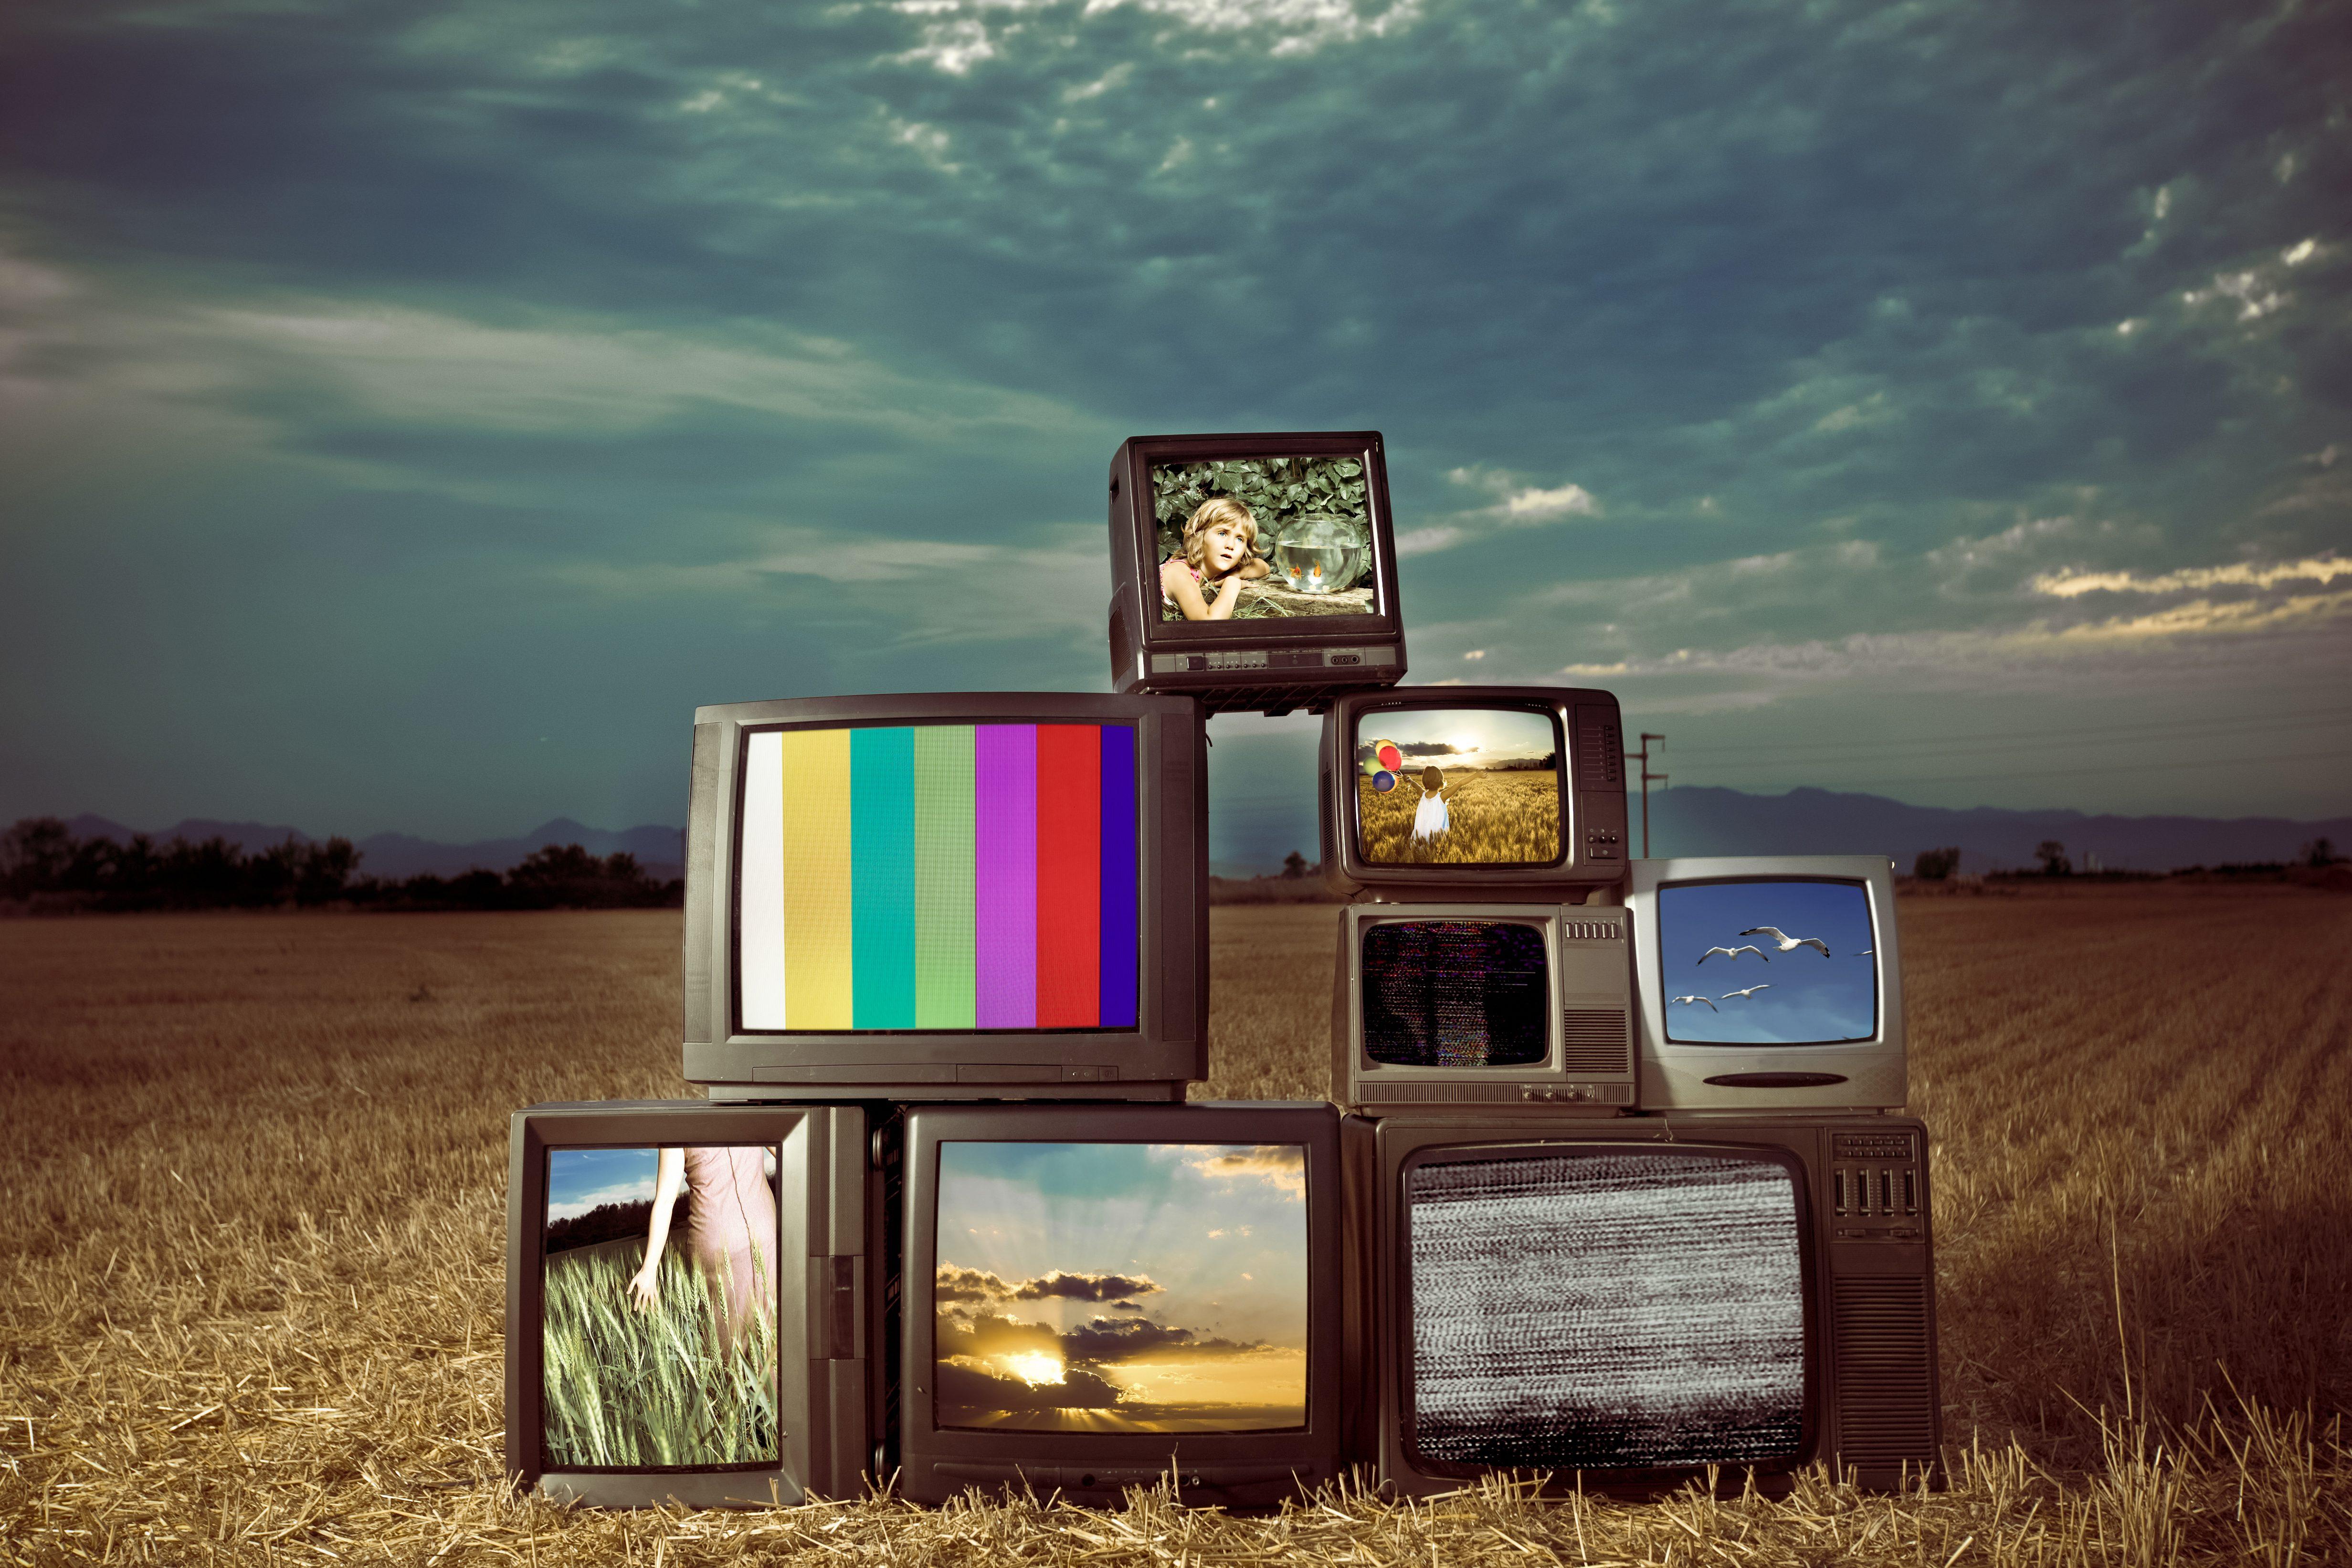 Телевизор реклама картинки сентябре